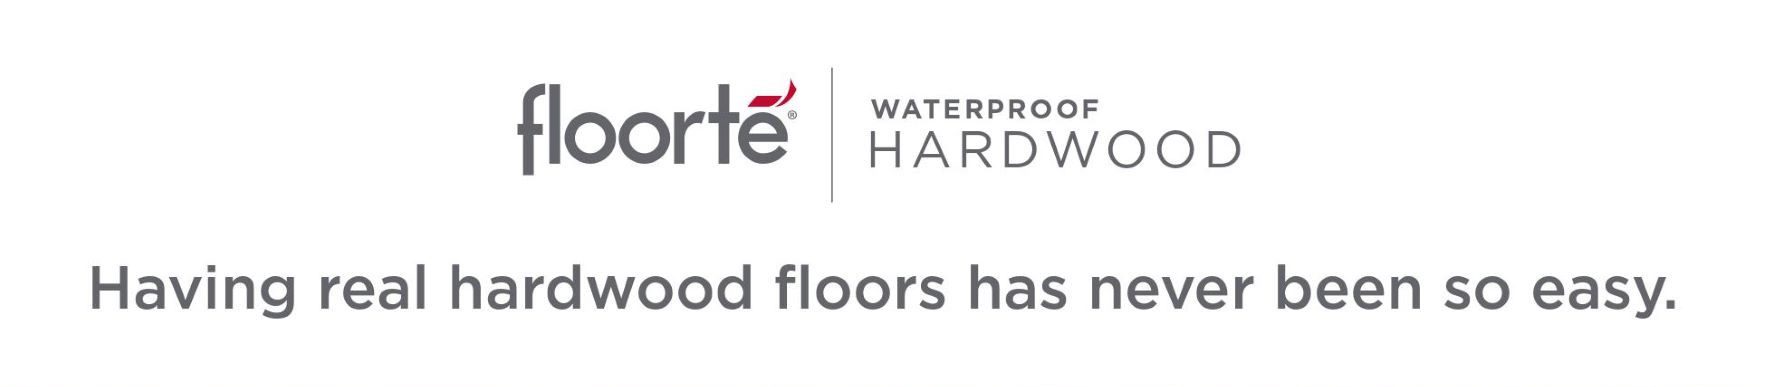 floorte logo